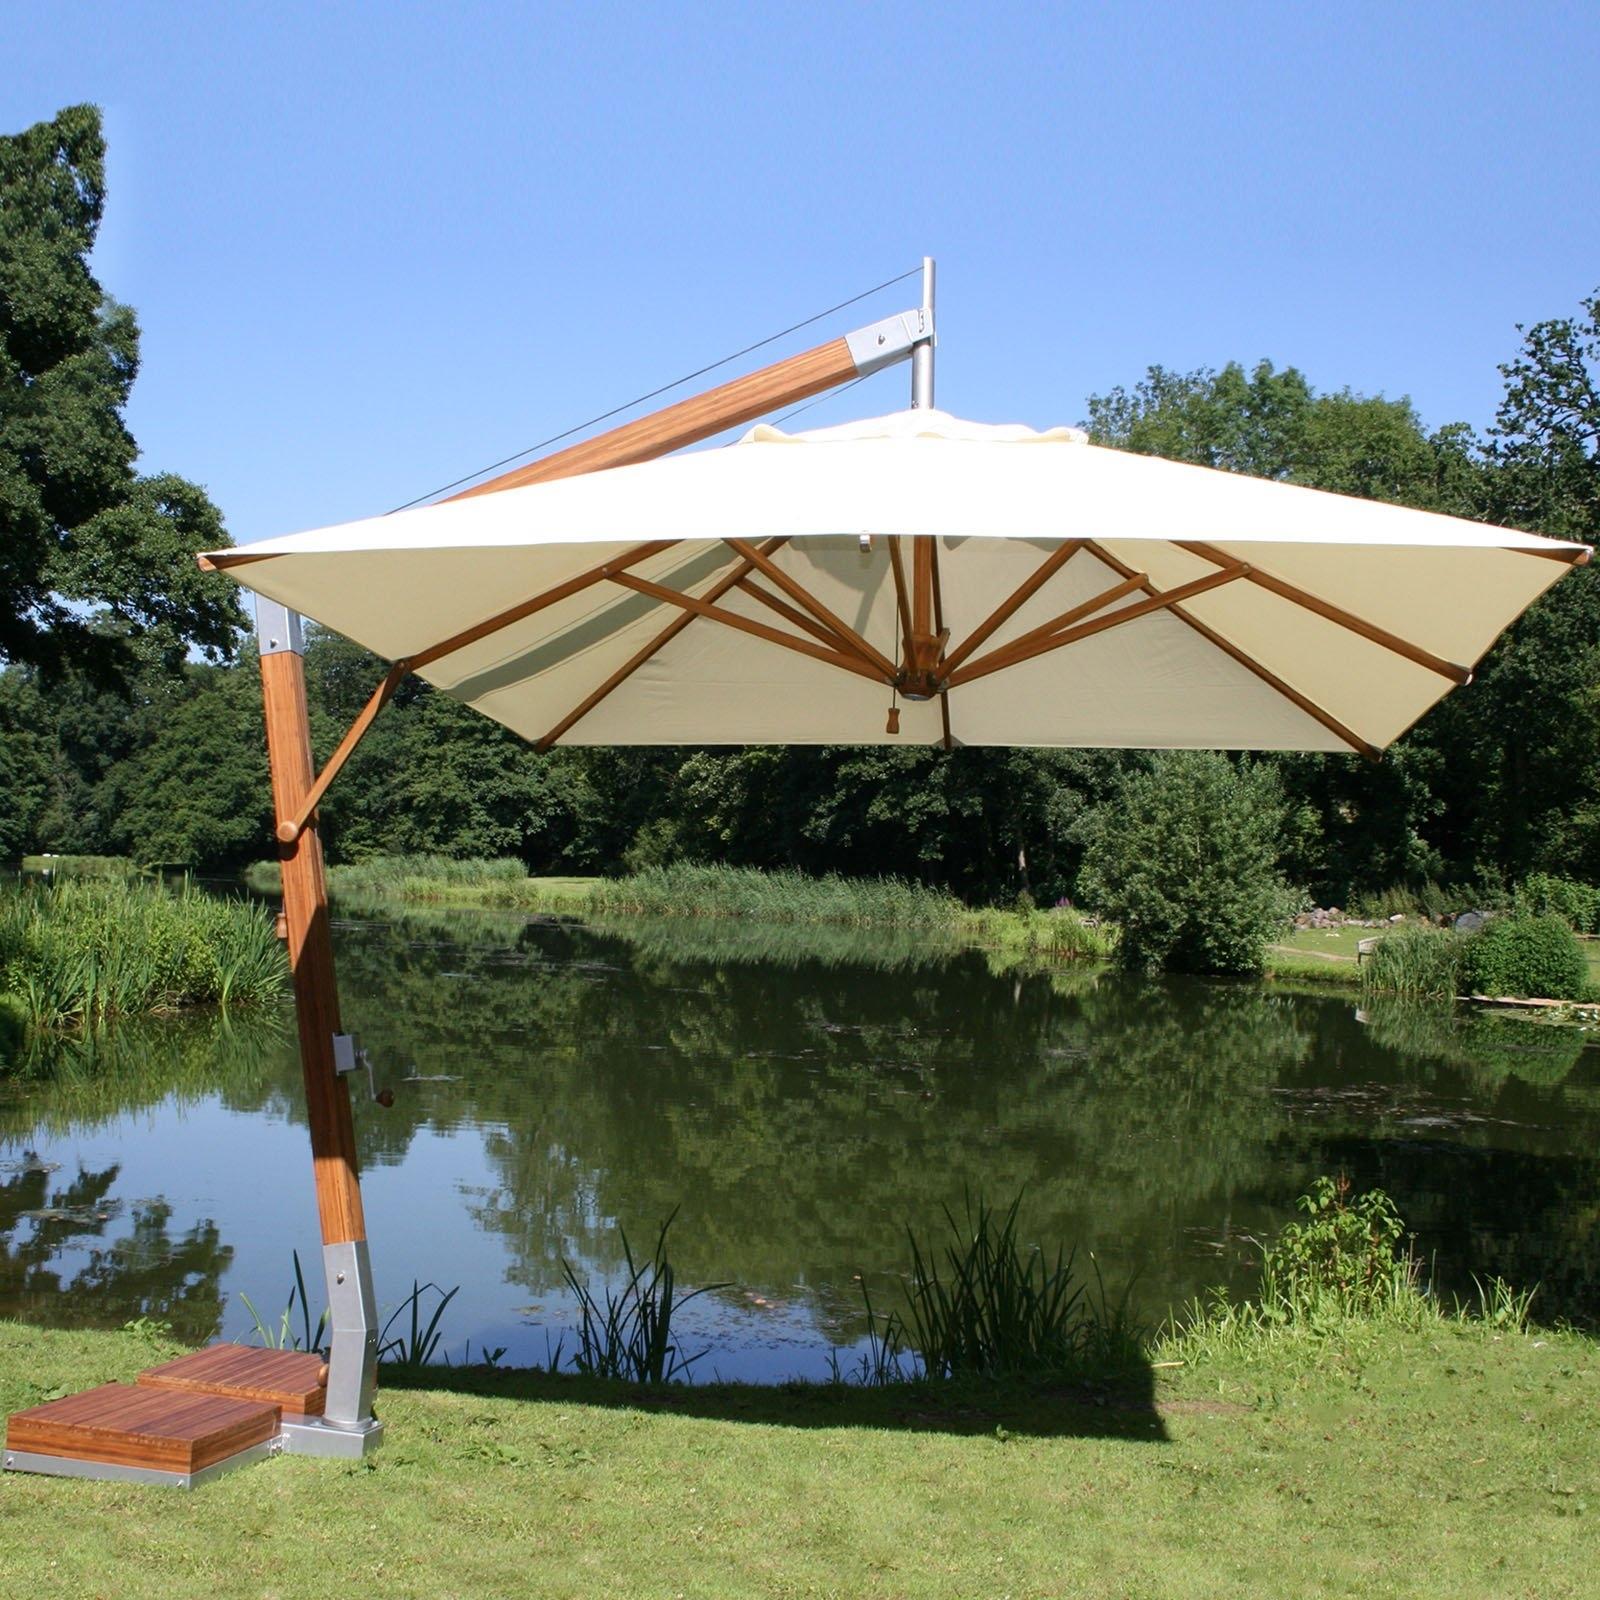 Favorite Offset Rectangular Patio Umbrellas With Furniture: Offset Patio Umbrellas For Your Outdoor Ideas (View 19 of 20)